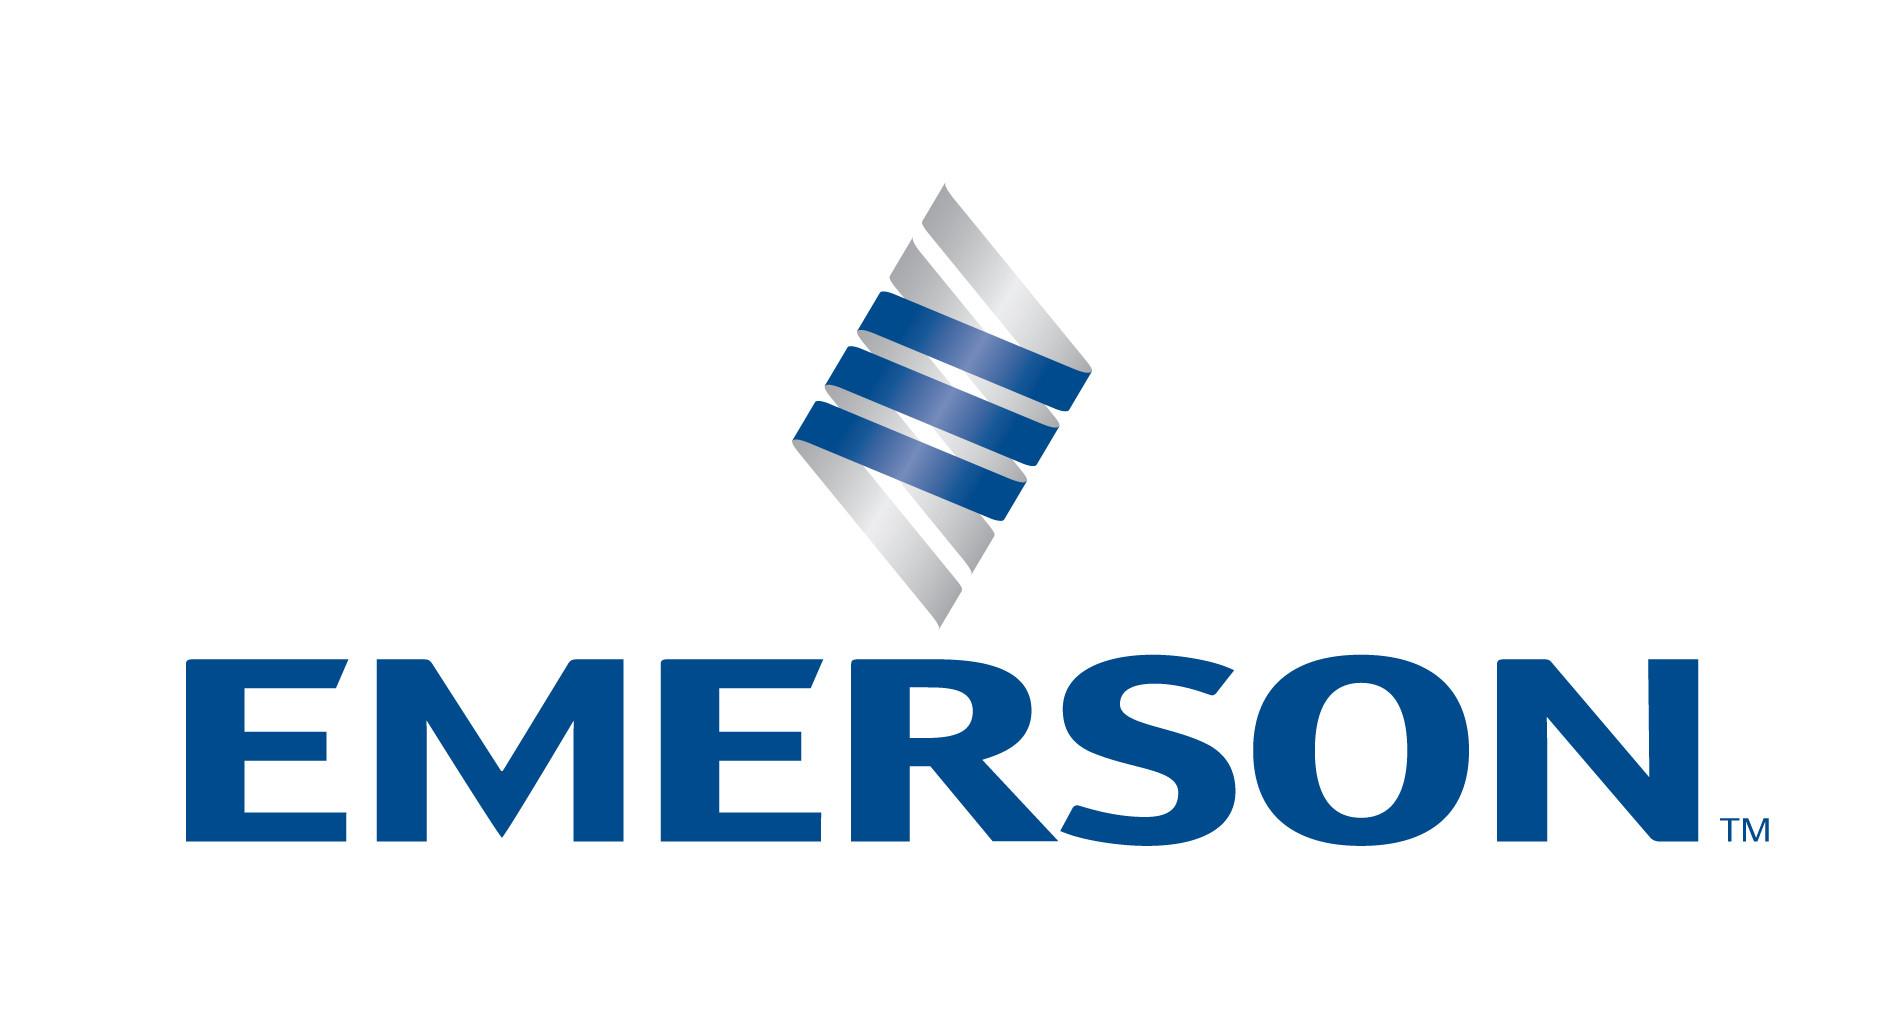 emerson-logo.jpg